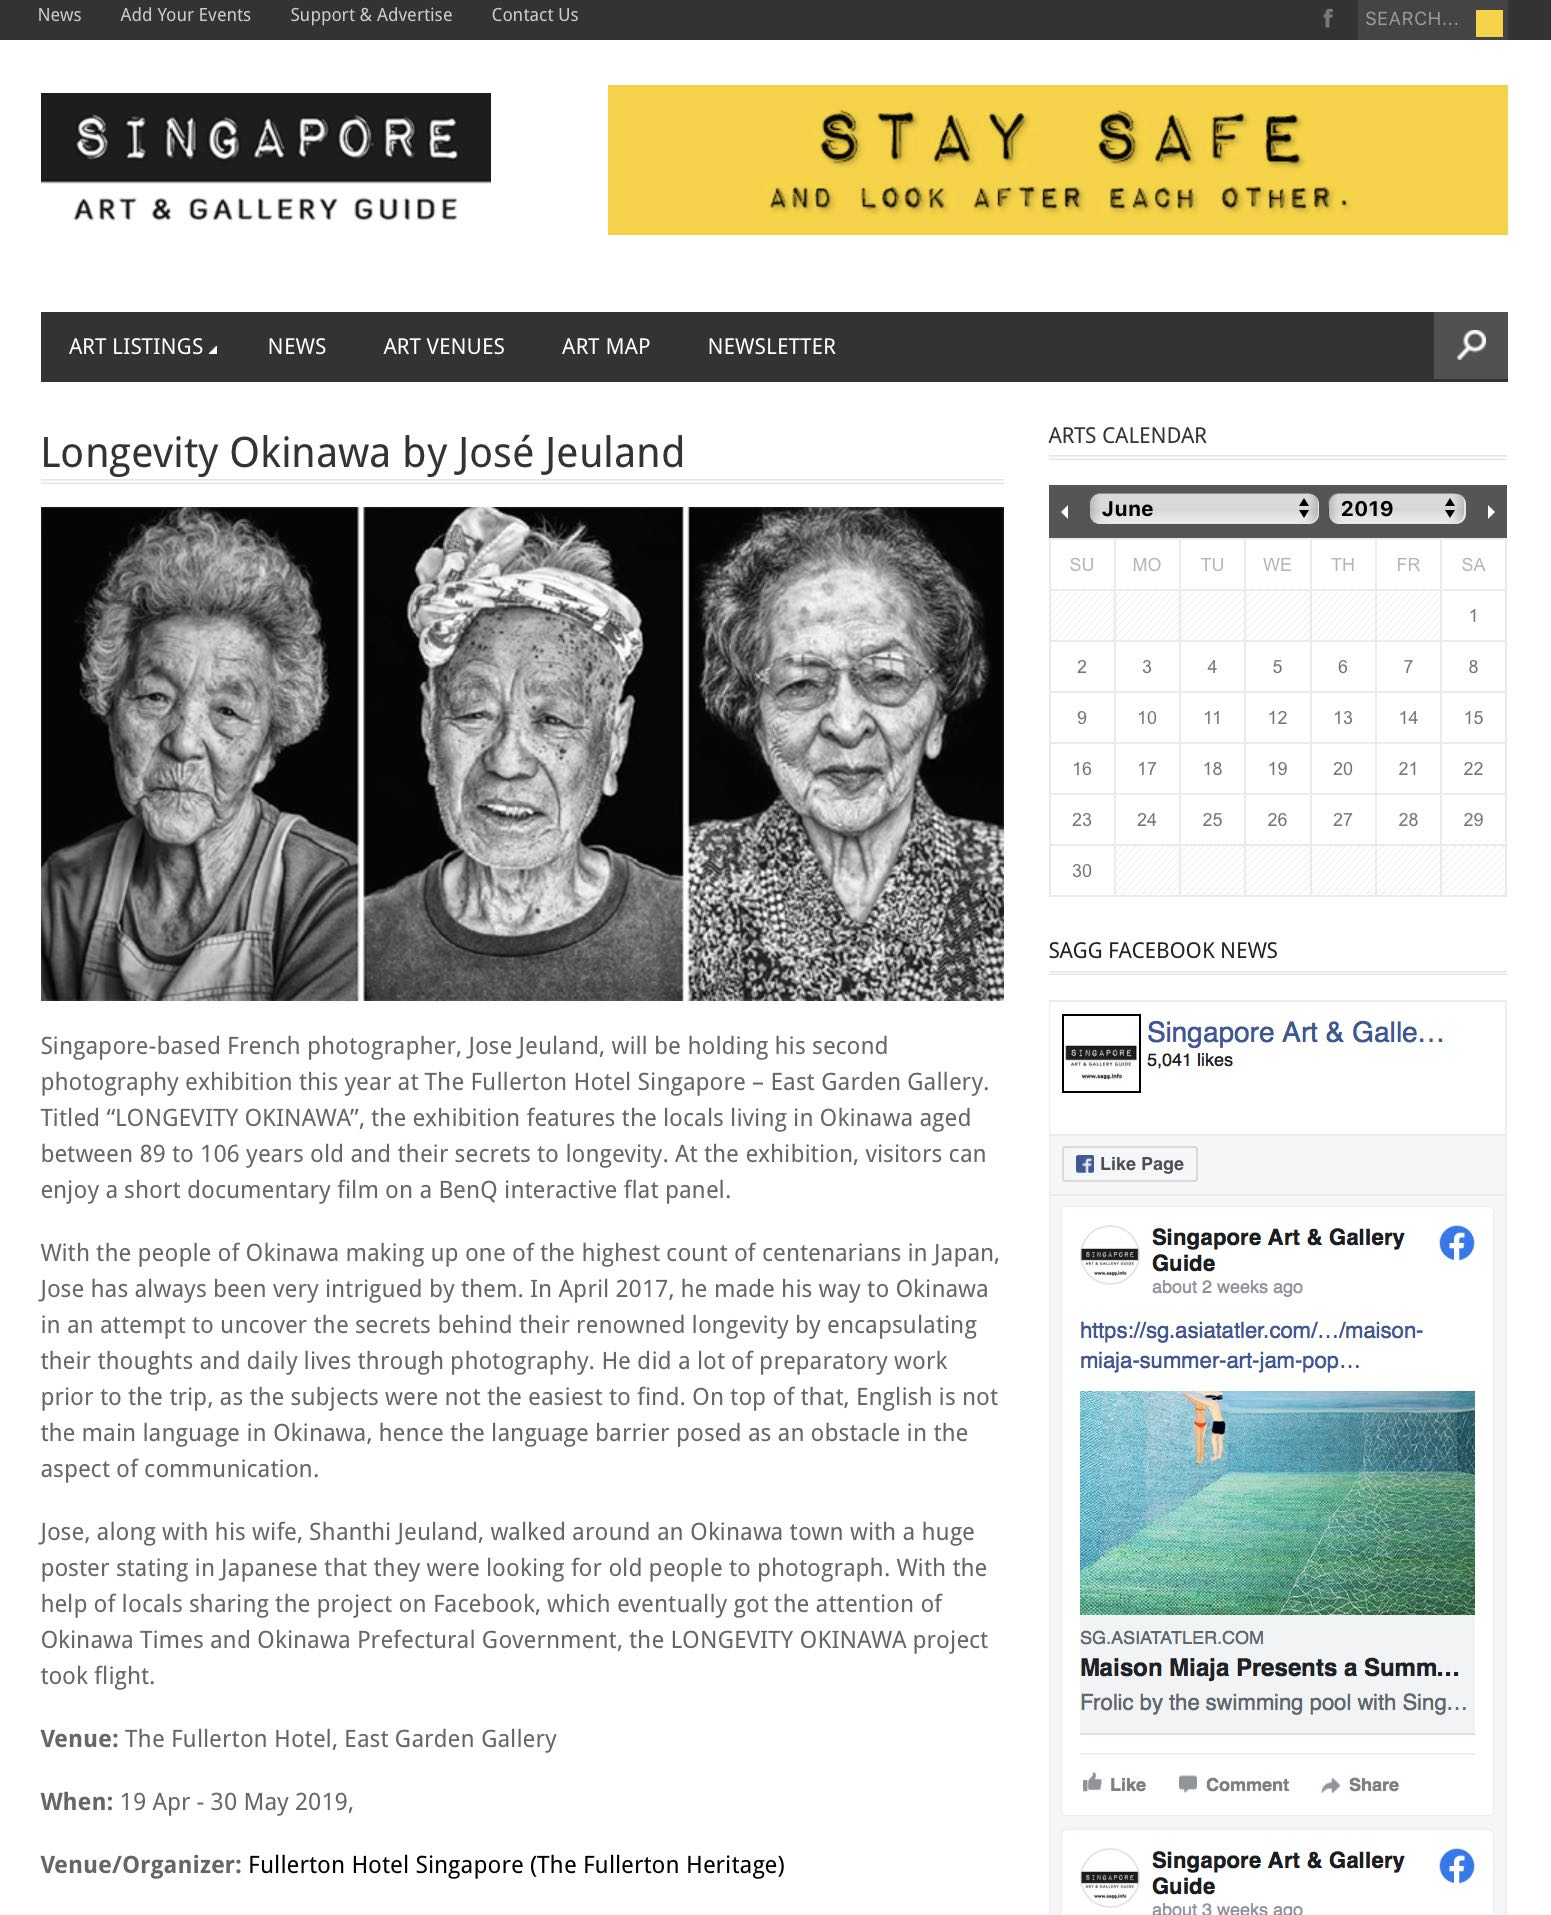 Singapore Art and Gallery Guide Longevity Okinawa Jose Jeuland 1